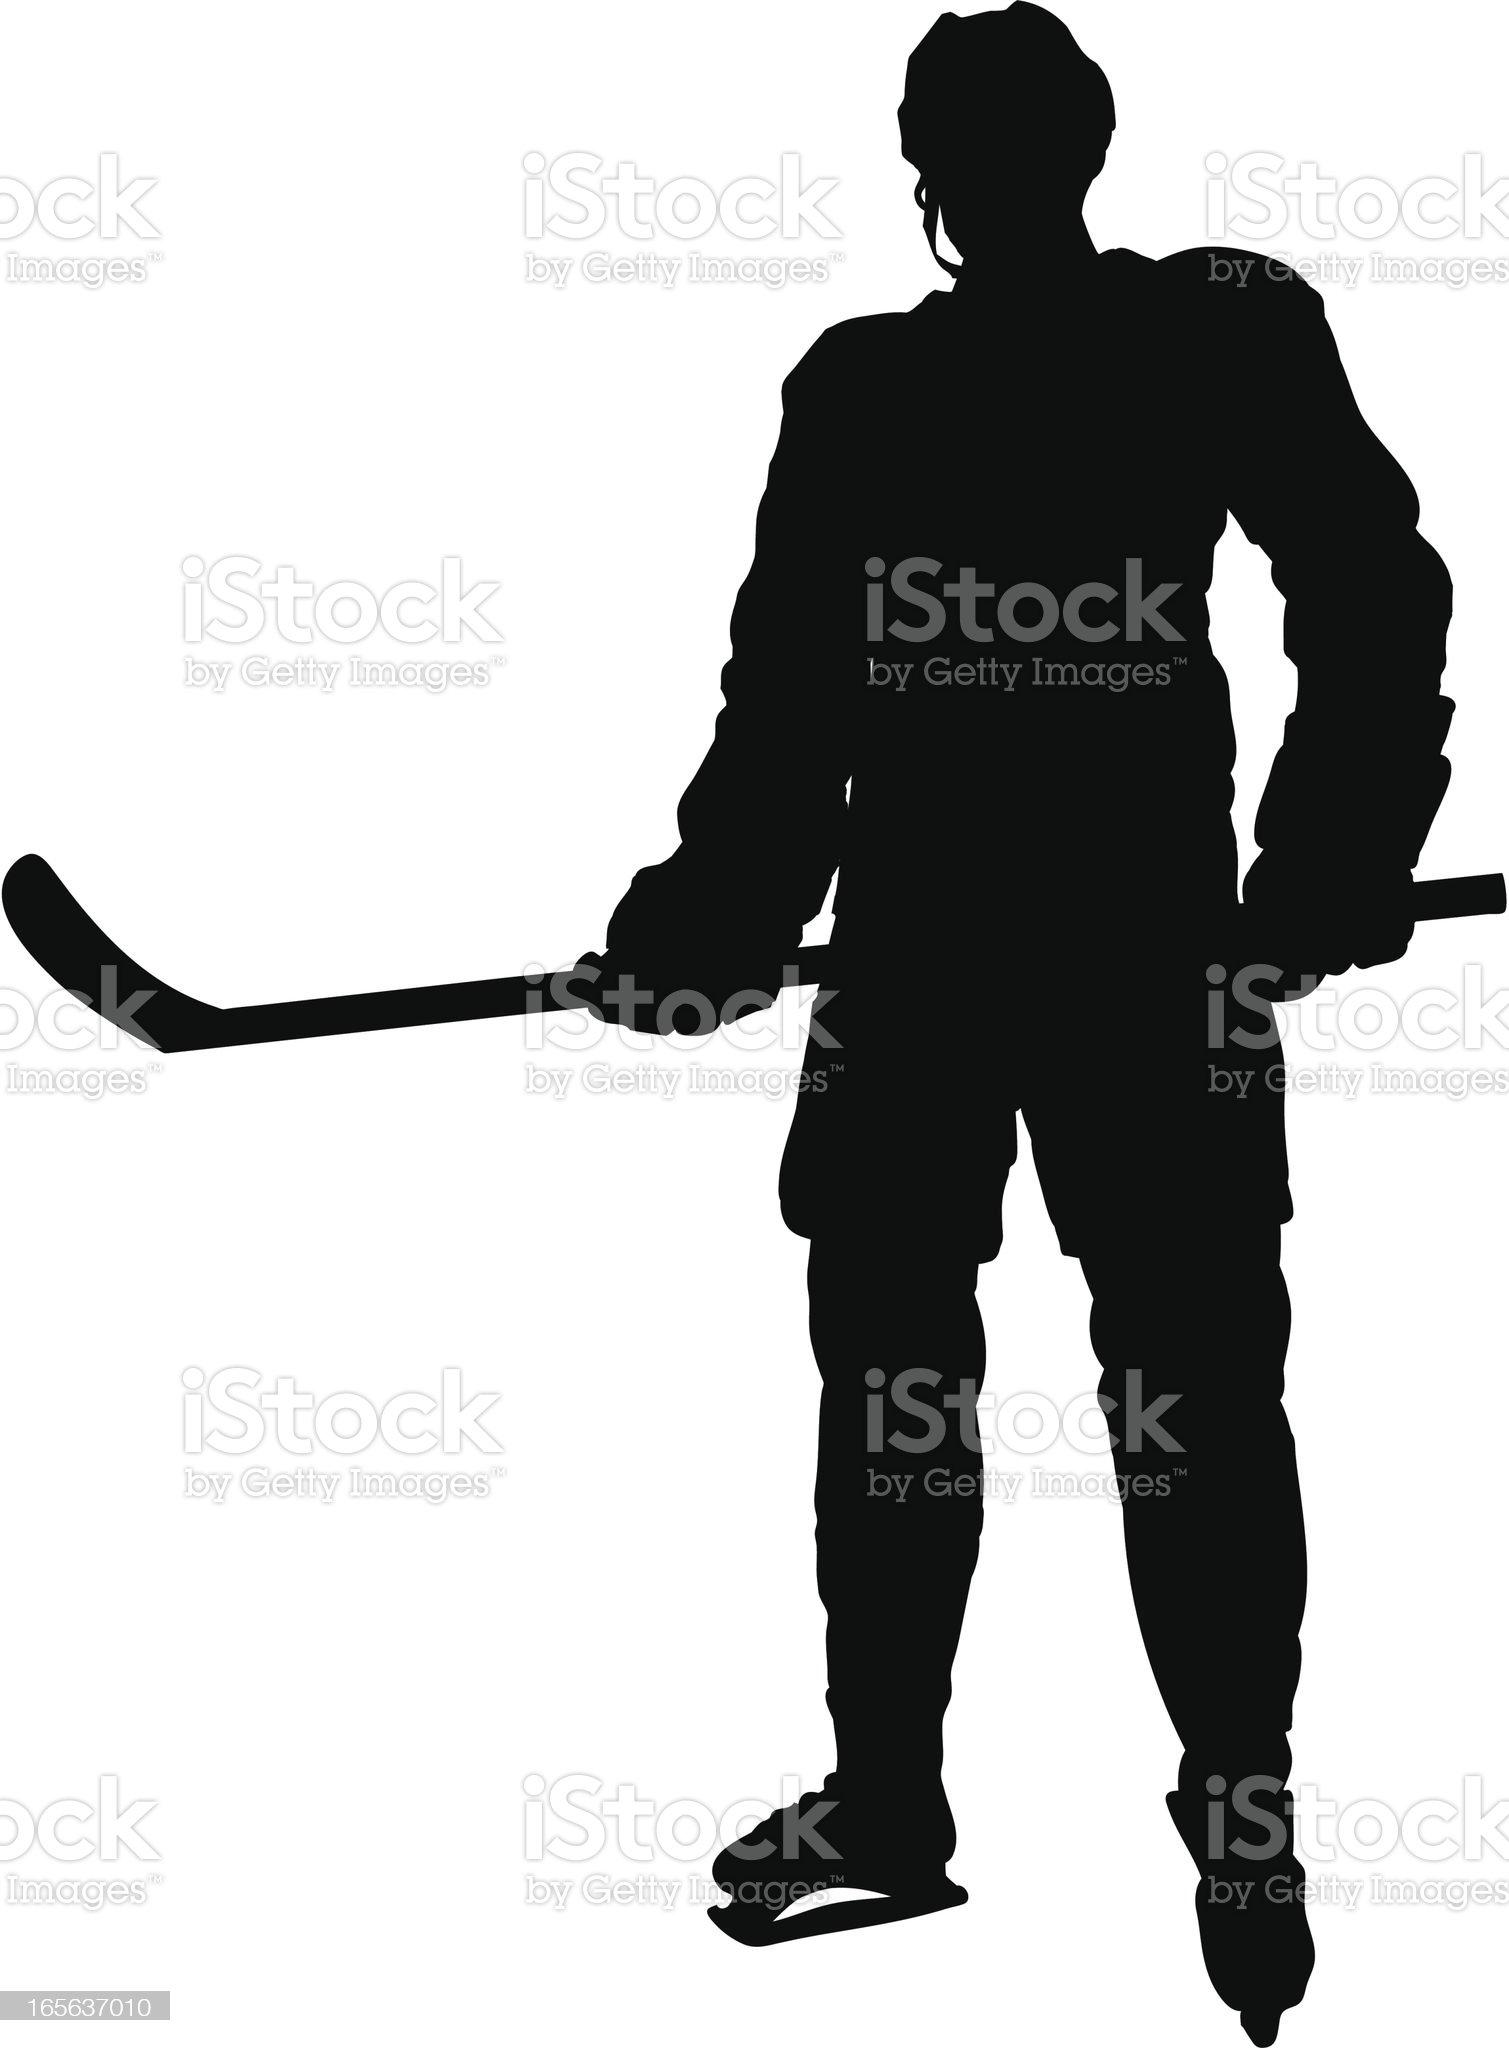 Hockey Player Silhouette royalty-free stock vector art